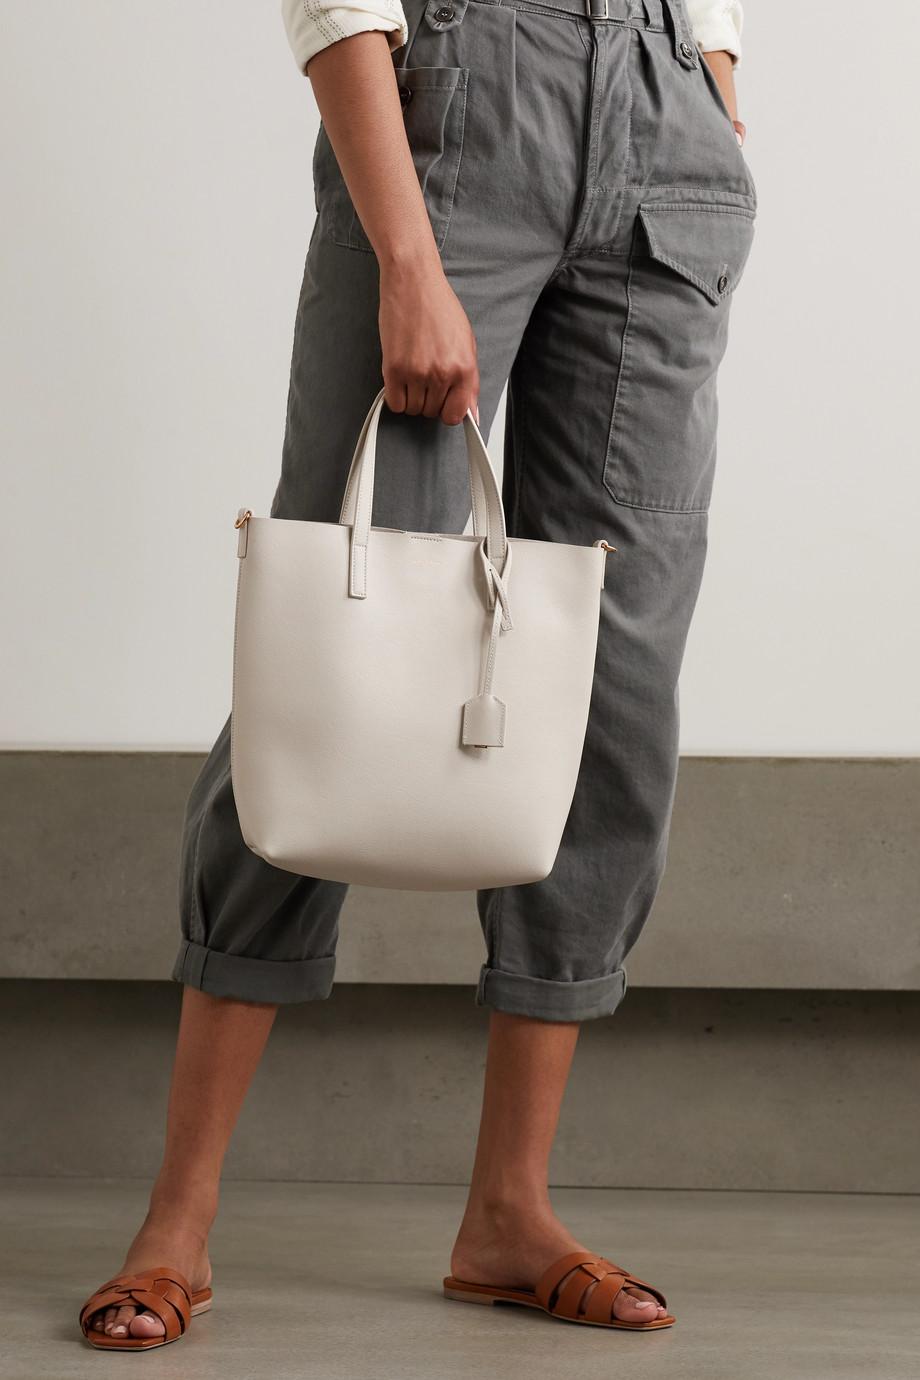 SAINT LAURENT Mini leather tote